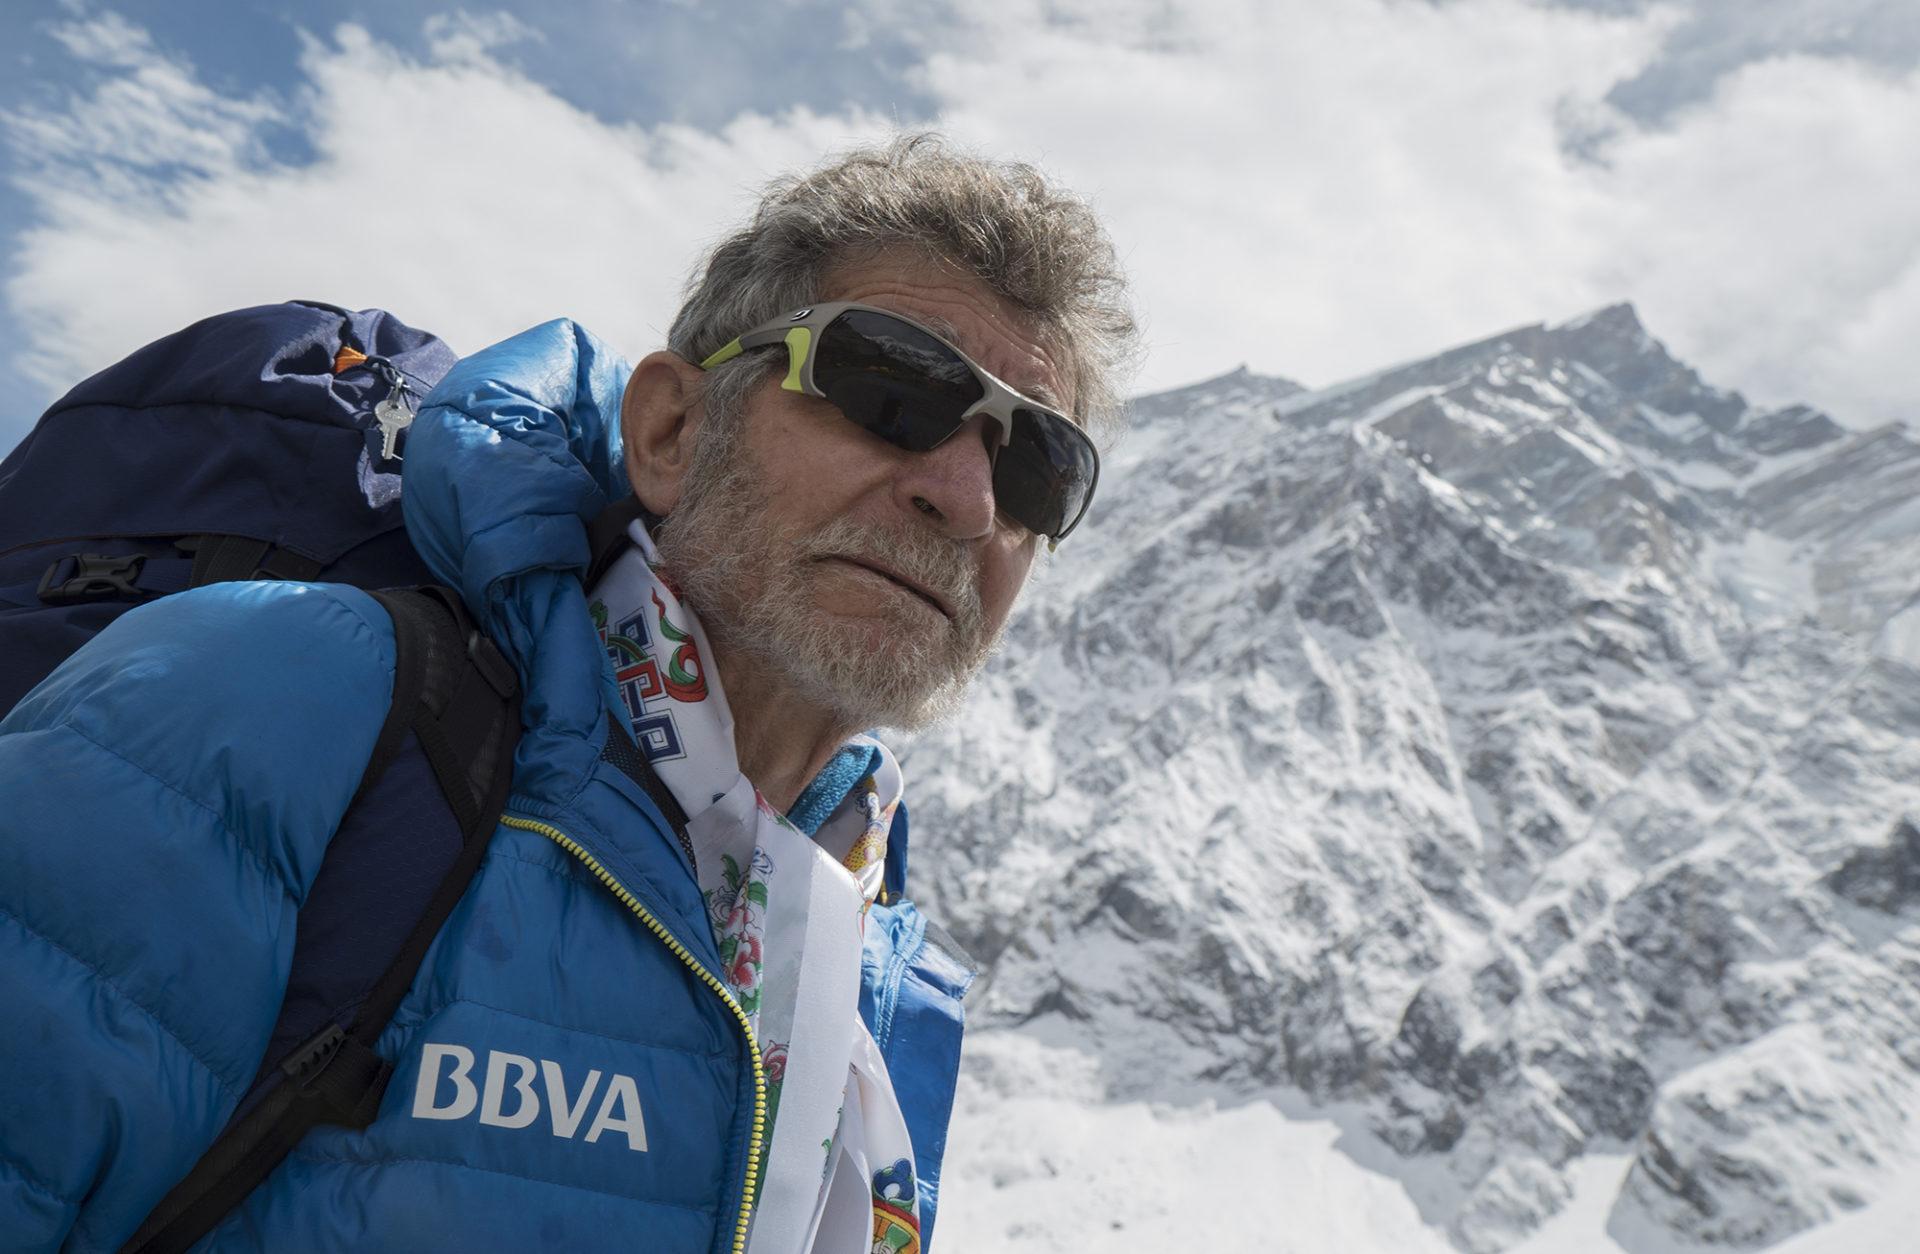 Carlos Soria arrives at the Annapurna Base Camp